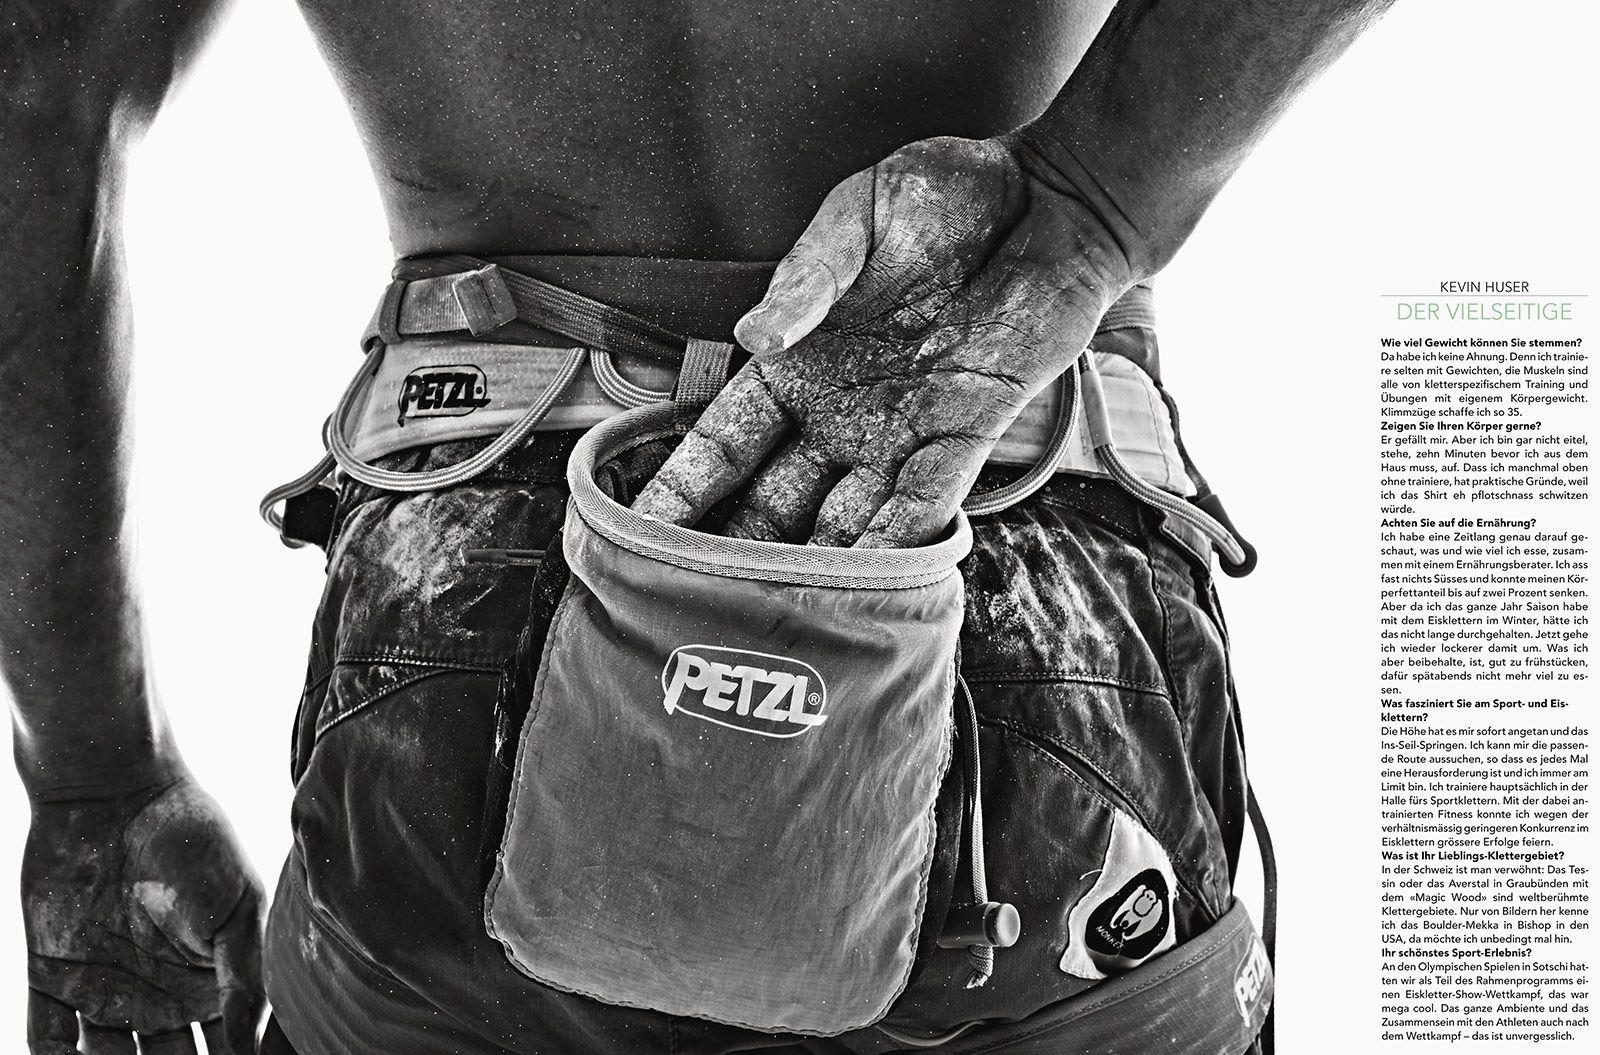 Christoph Köstlin - Muskelspiele Portrait-Series // 16 // Kevin Huser // black-white portrait // climber // sportclimbing // mountaineering // boulder // boulding // body work // muscles